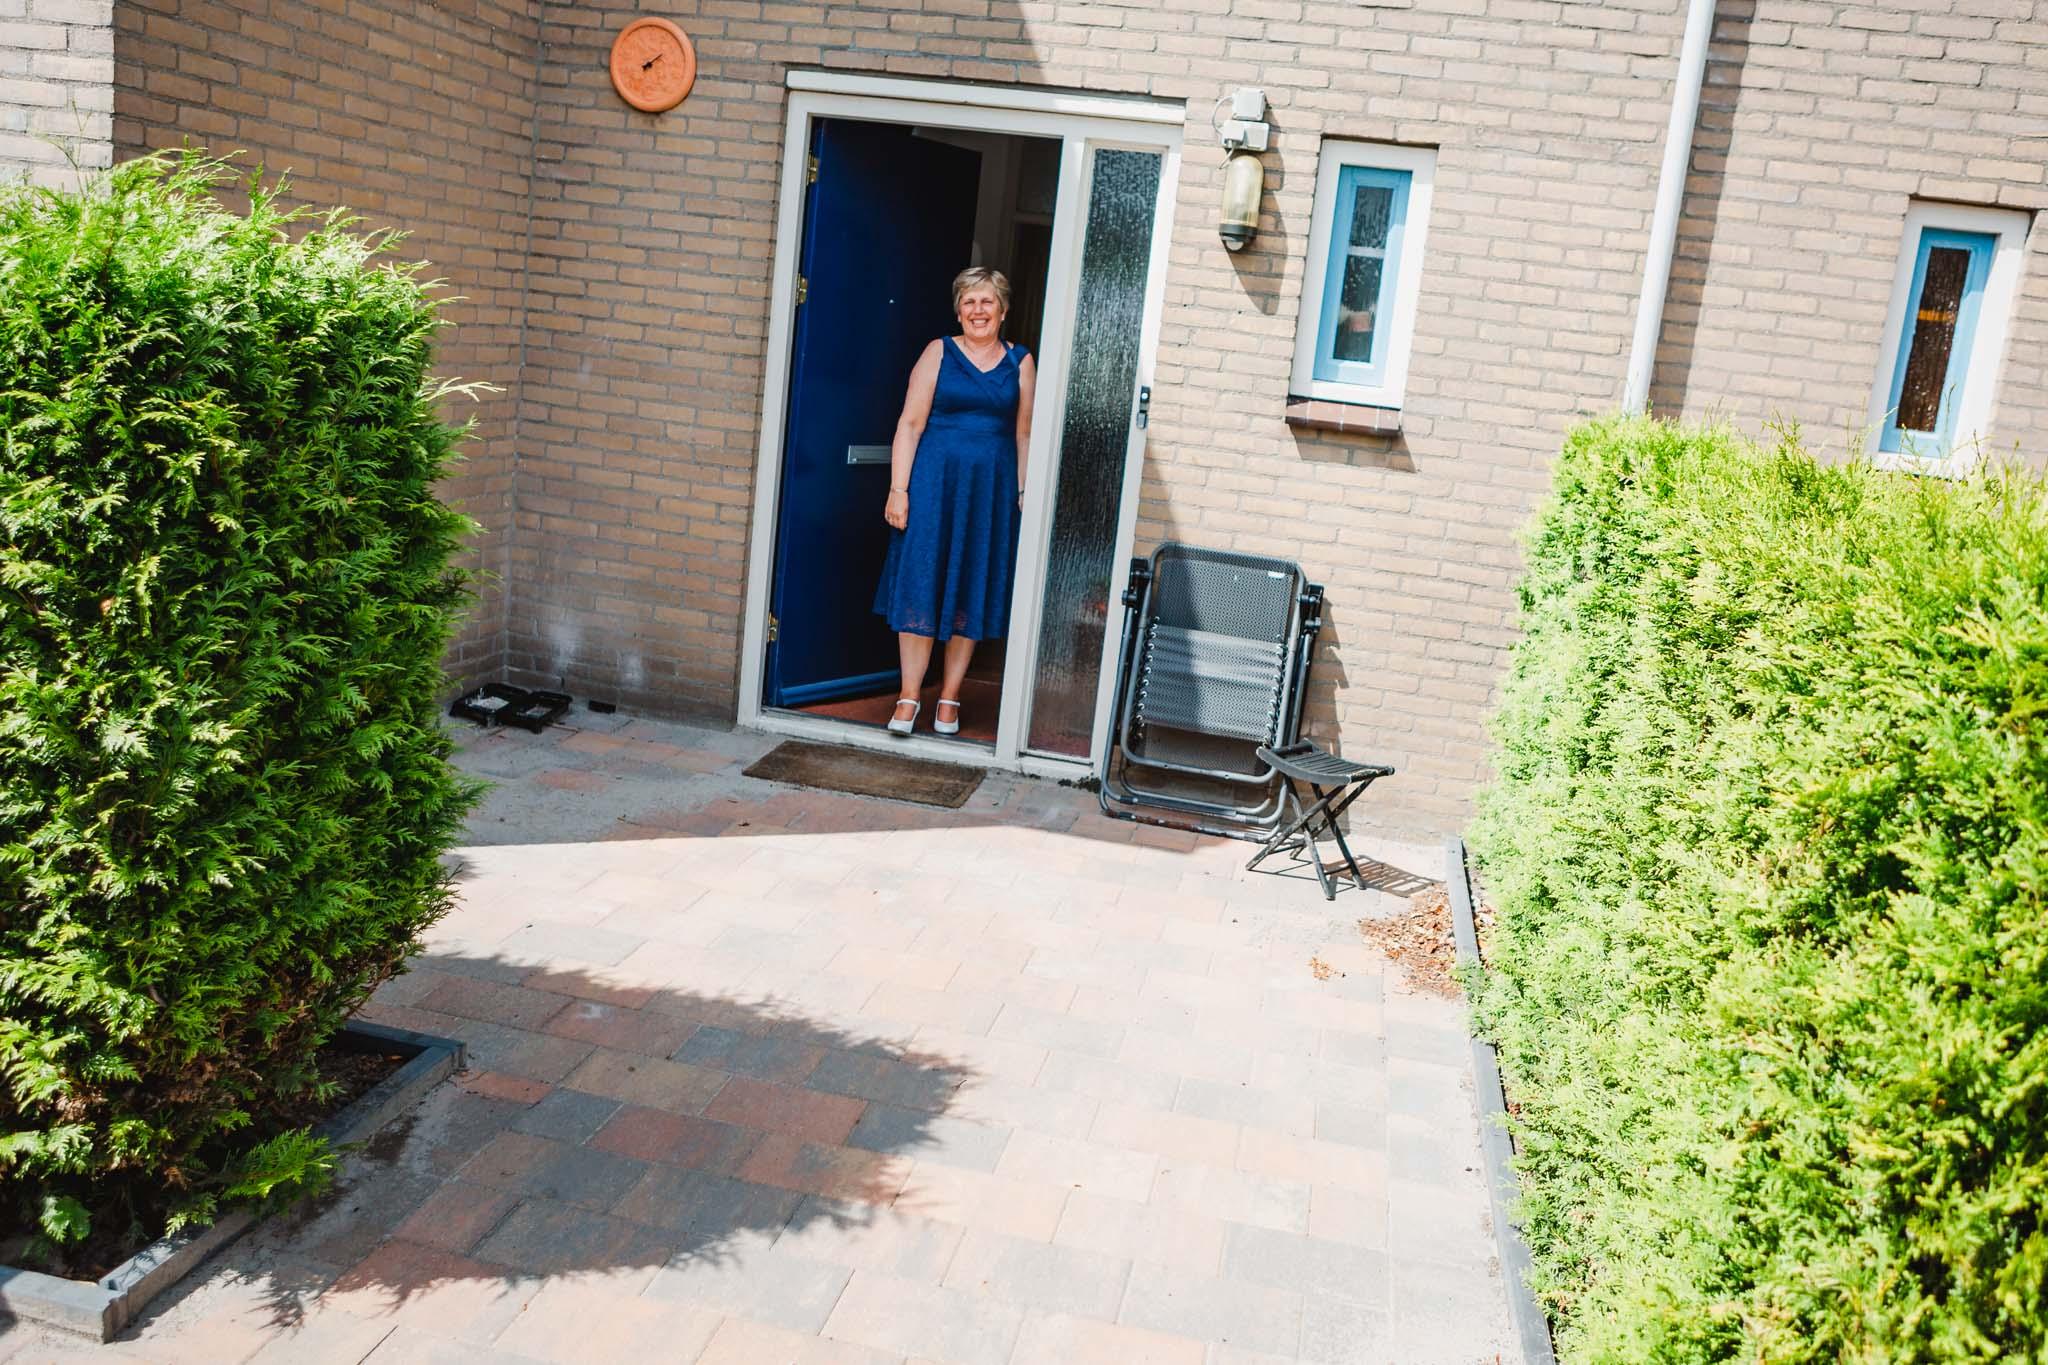 Bruiloft Reportage Geregistreerd Partnerschap Flevoland Lelystad Shot By Sylla 7